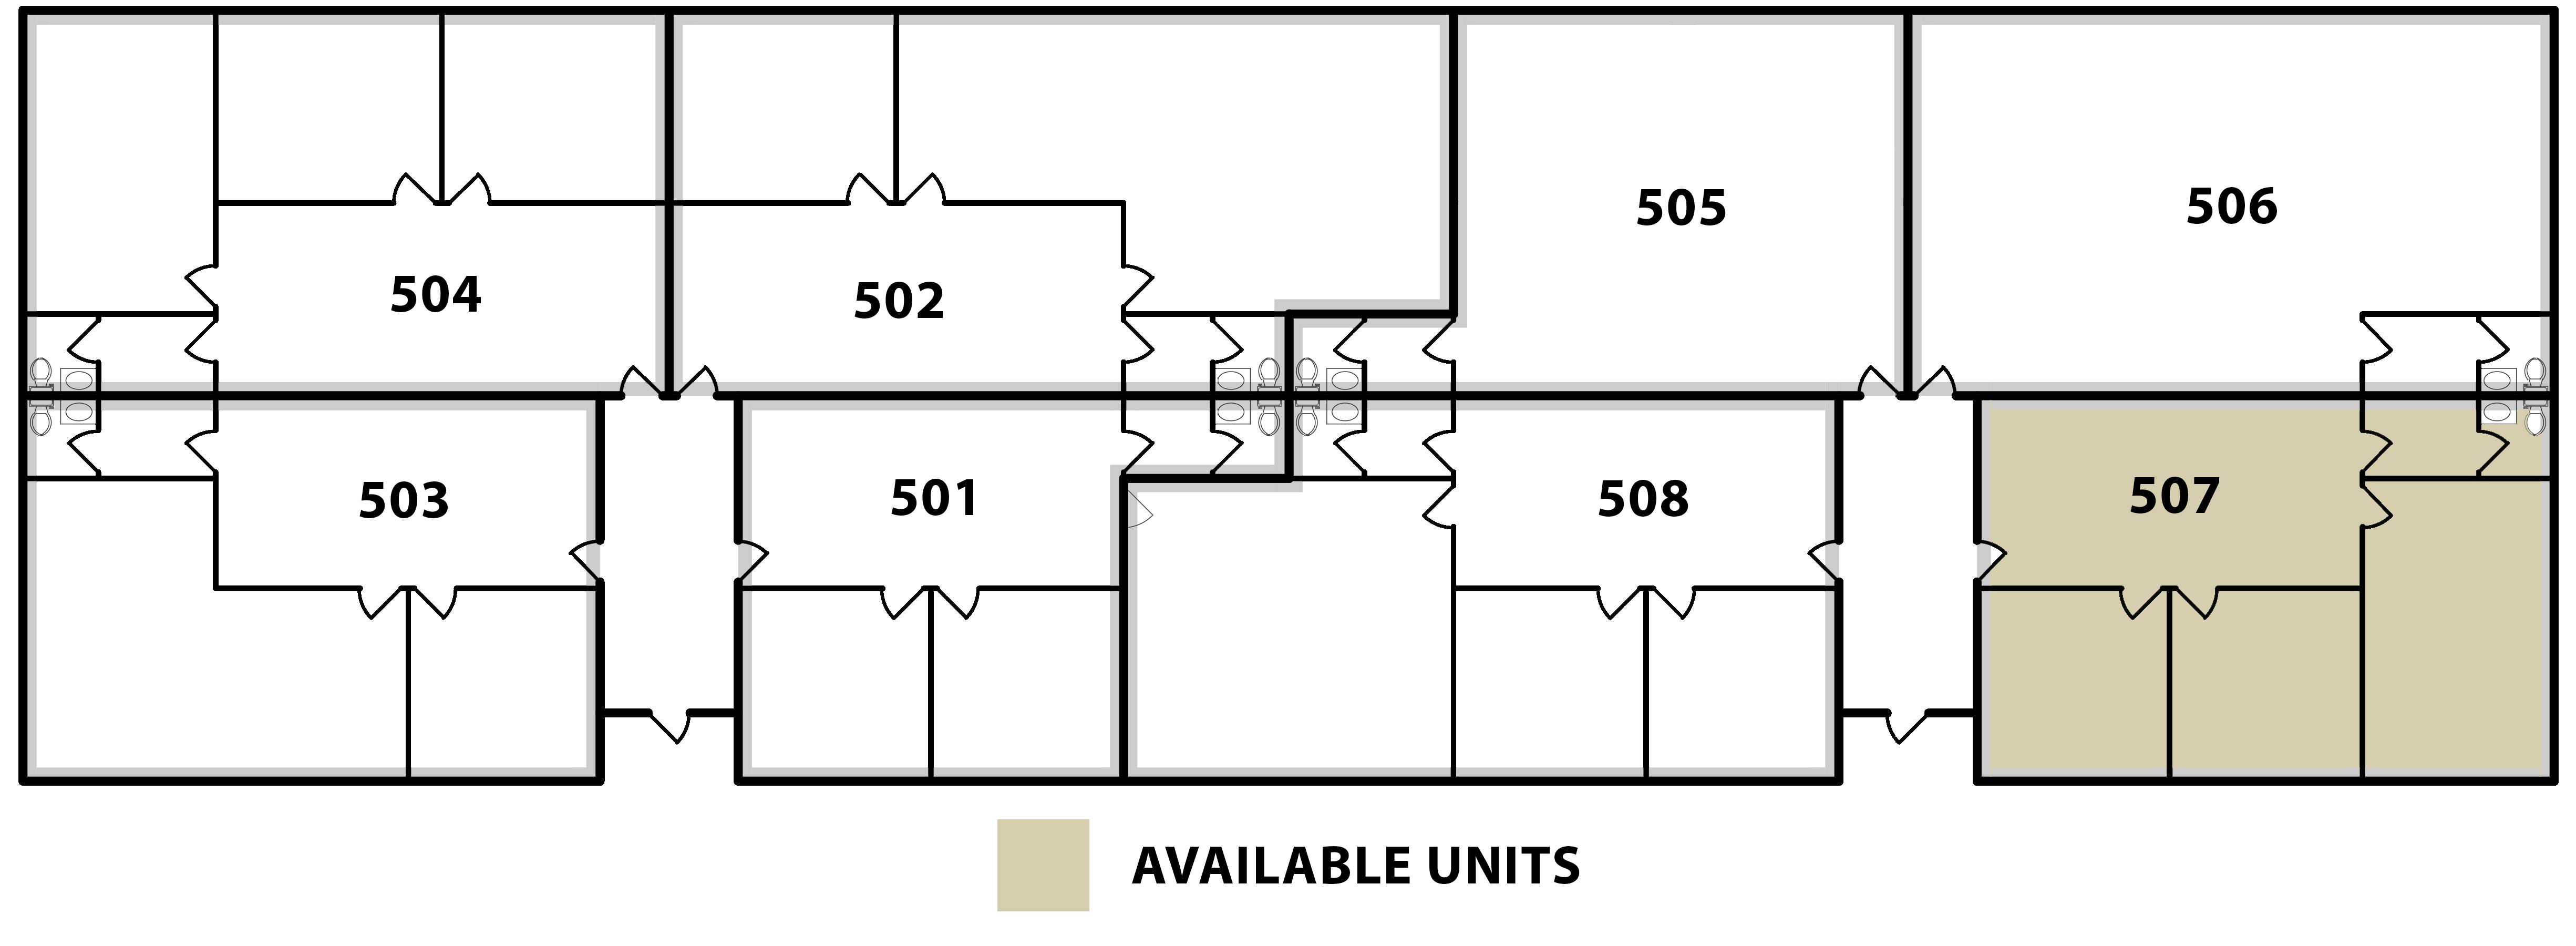 Building V - 3115